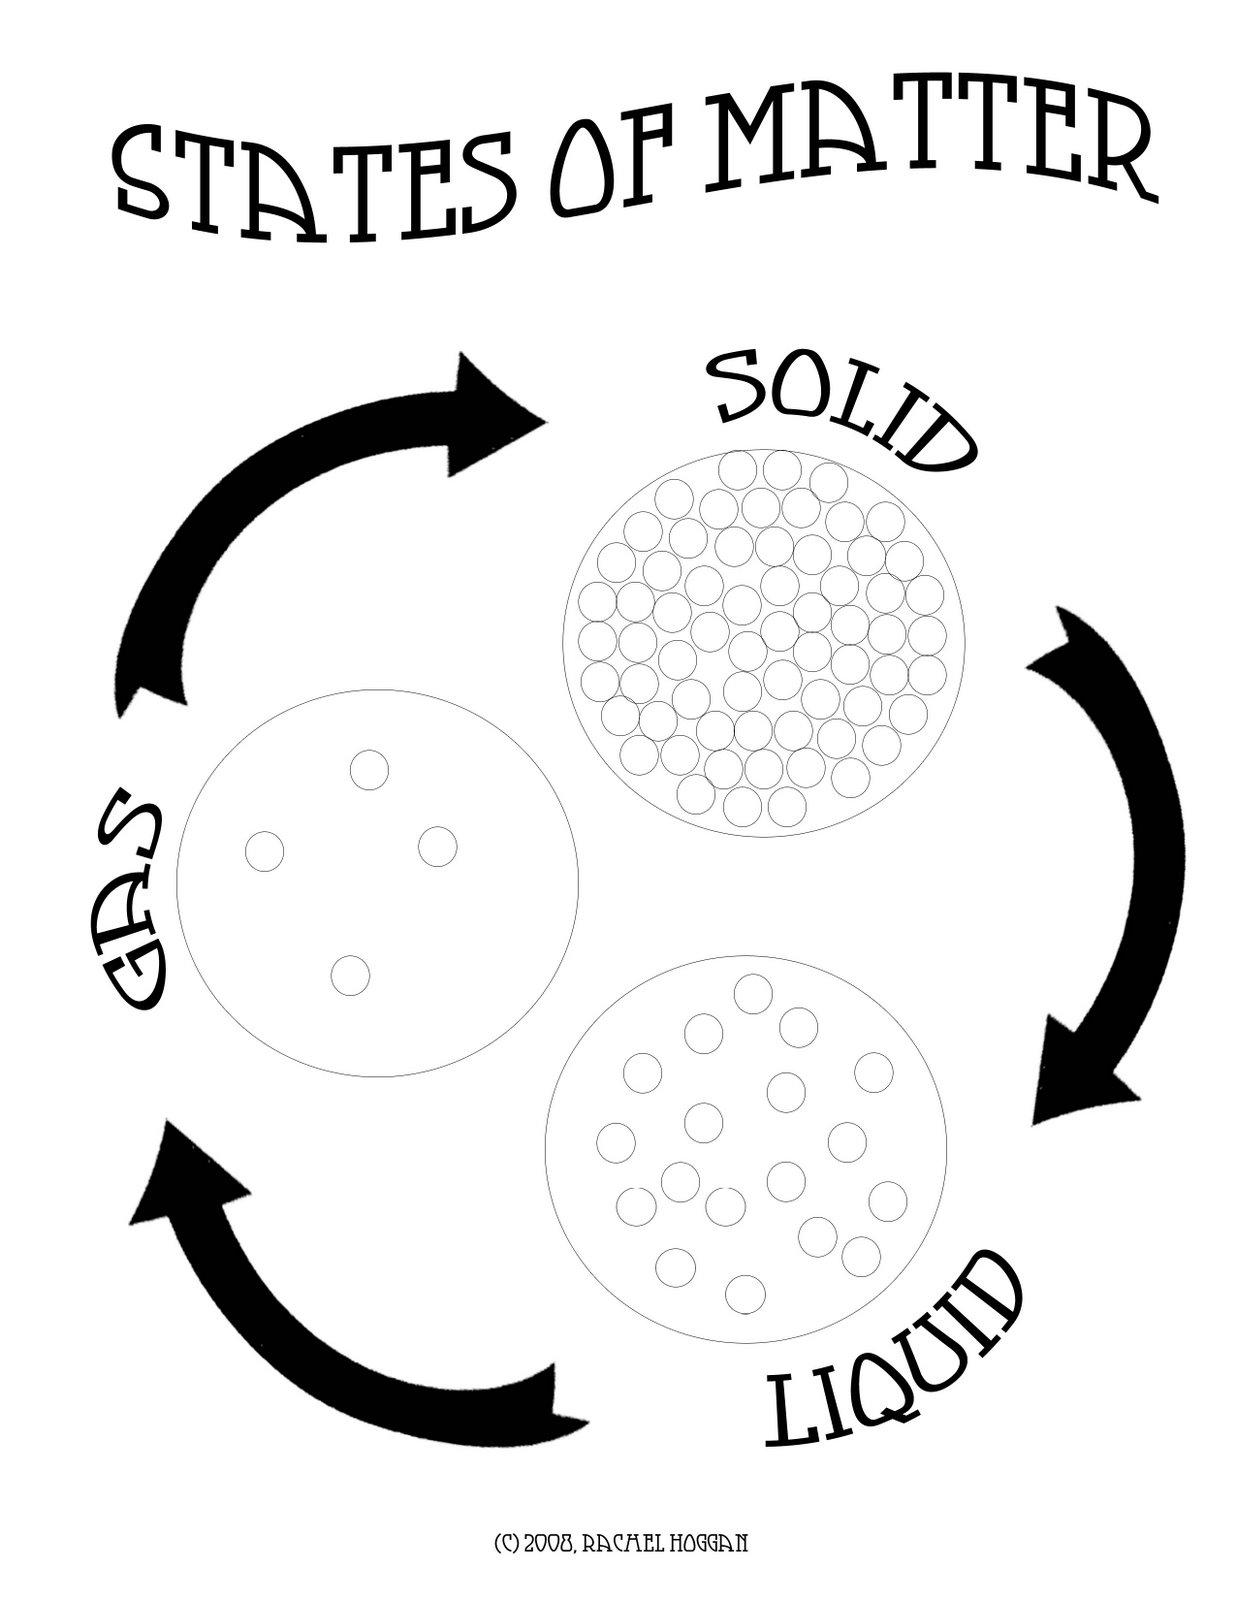 matter states science lesson coloring plan solids liquids gases teaching pages activities gas kindergarten printable grade handout activity lessons preschool